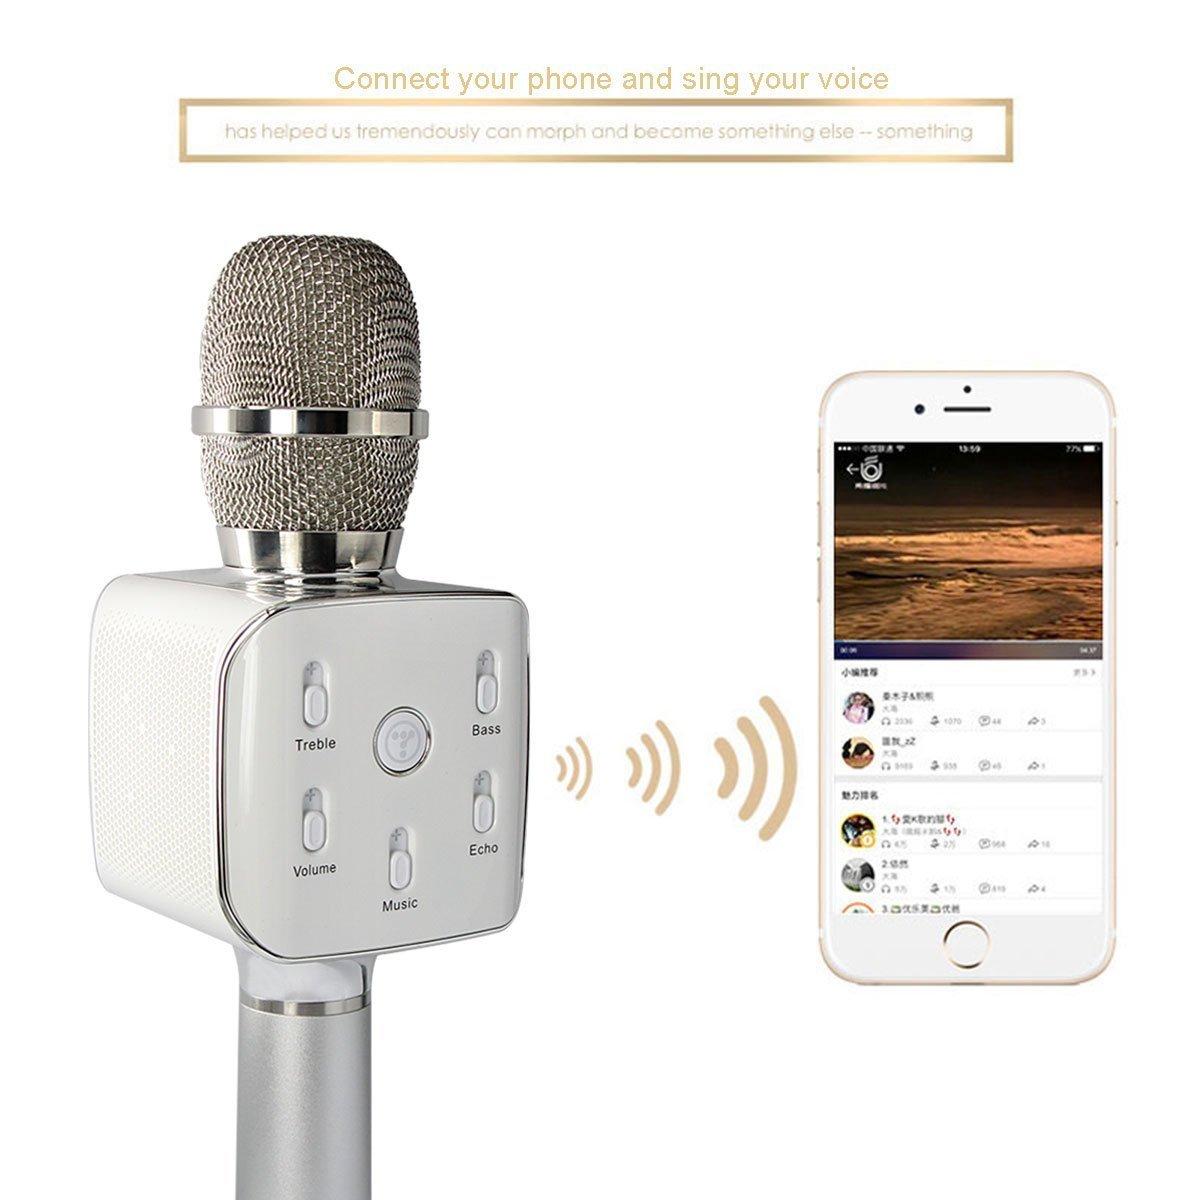 Genuine Tuxun Teana 2 Wireless Bluetooth Speaker Ecko Headphone Mic Jack Wiring Diagram Microphone Karaoke Ktv Player Handheld Condenser Large Capacity Battery Silver Home Audio